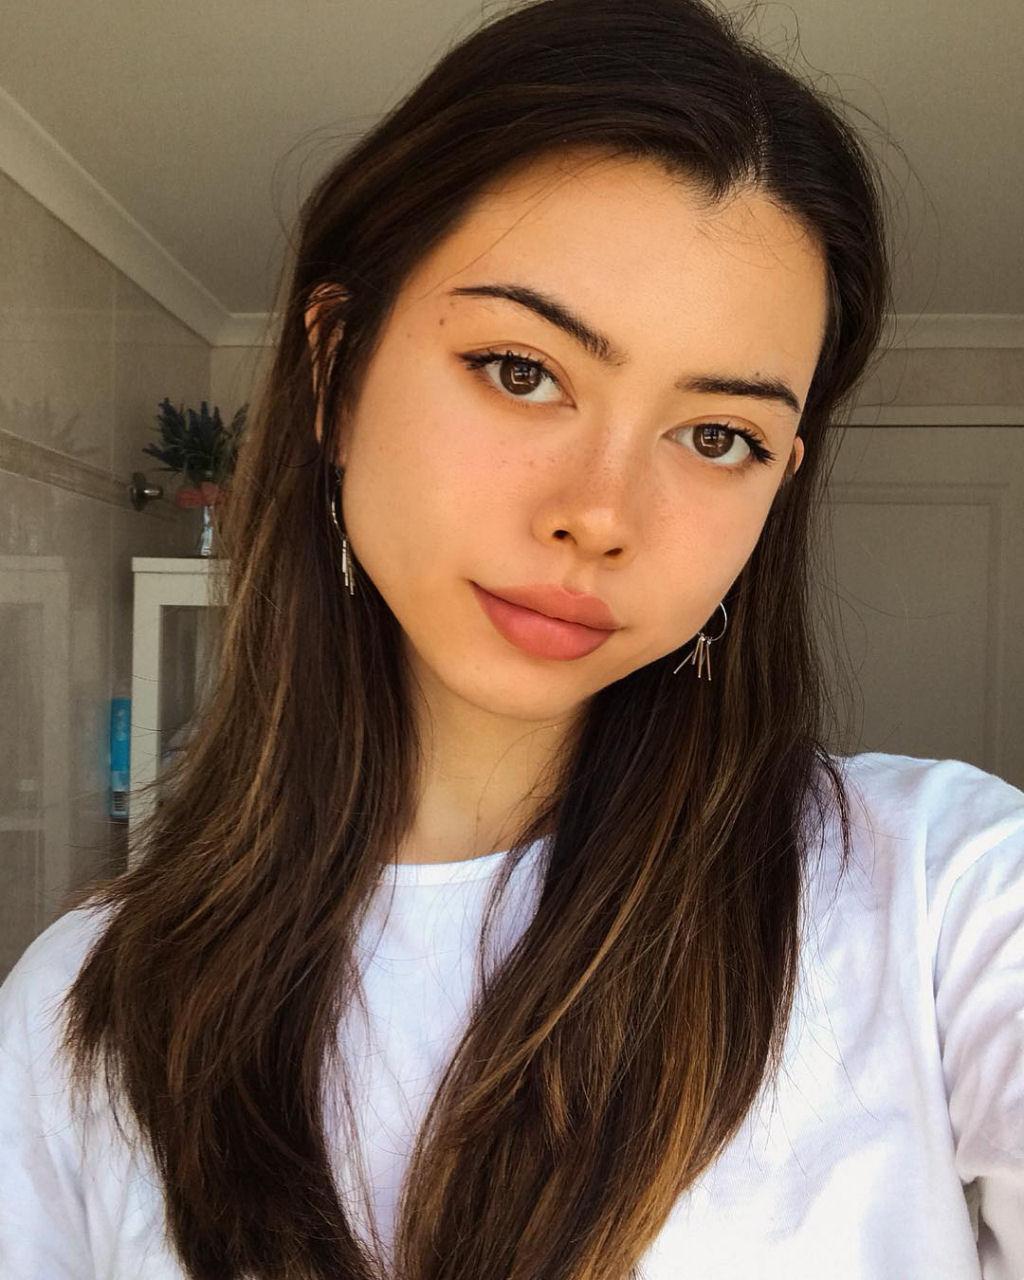 beleza_micigenacao_27.jpg